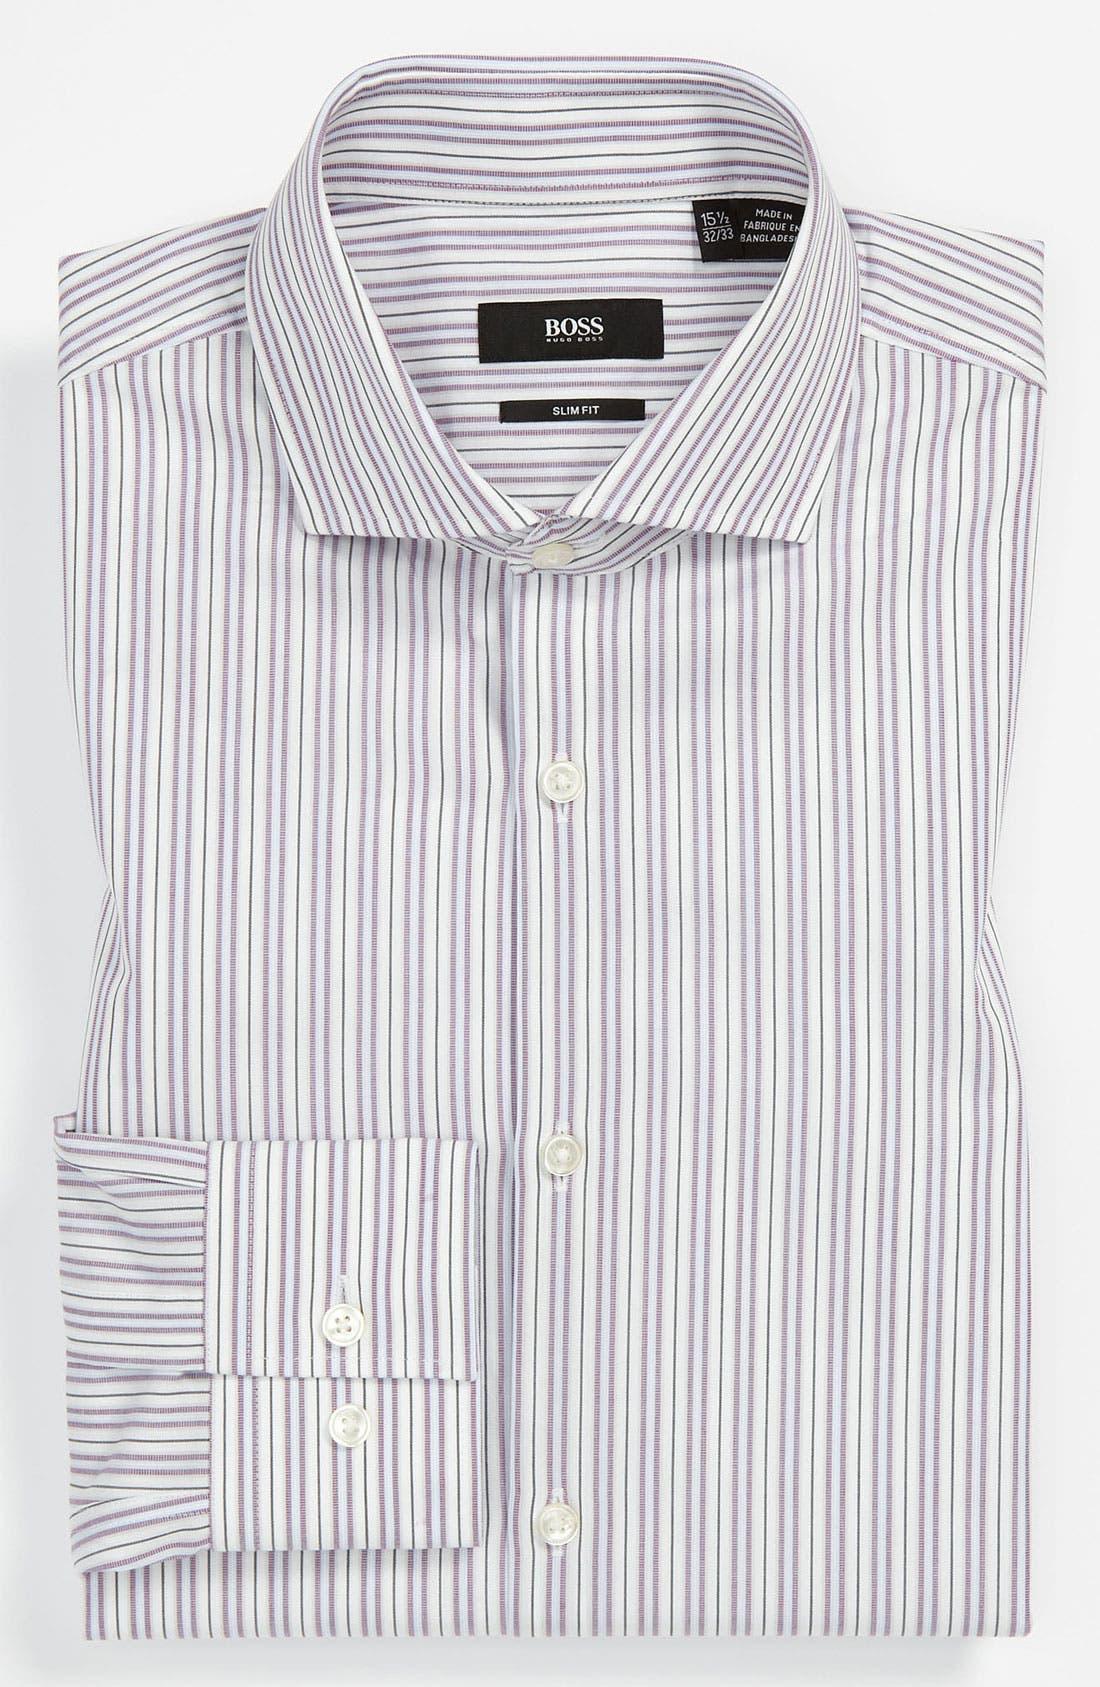 Alternate Image 1 Selected - BOSS Black Slim Fit Dress Shirt (Online Only)